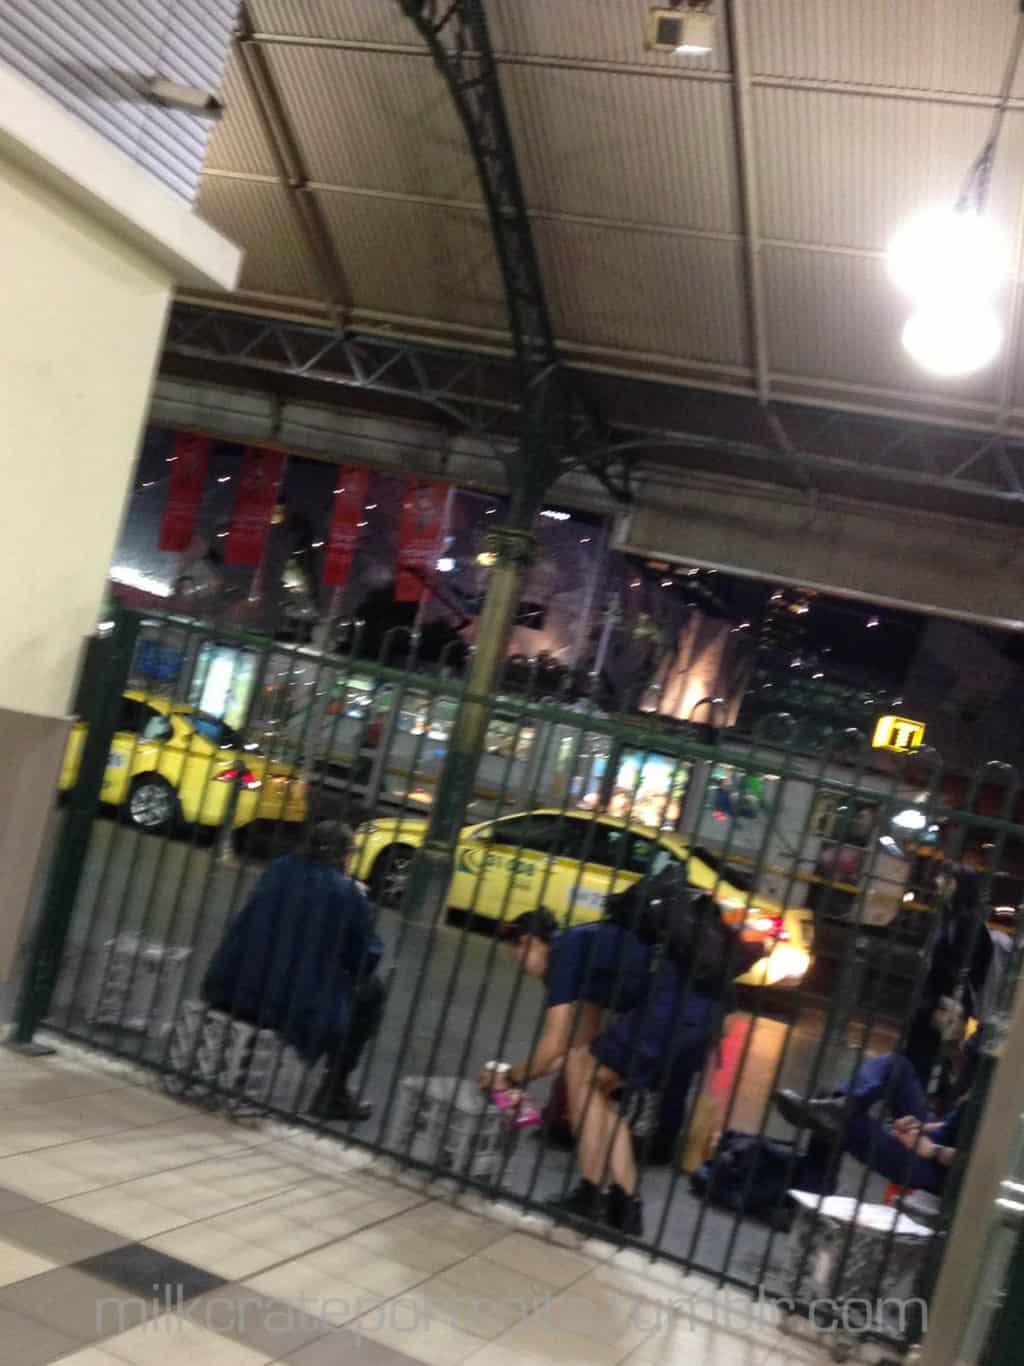 Waiting at Flinders St station